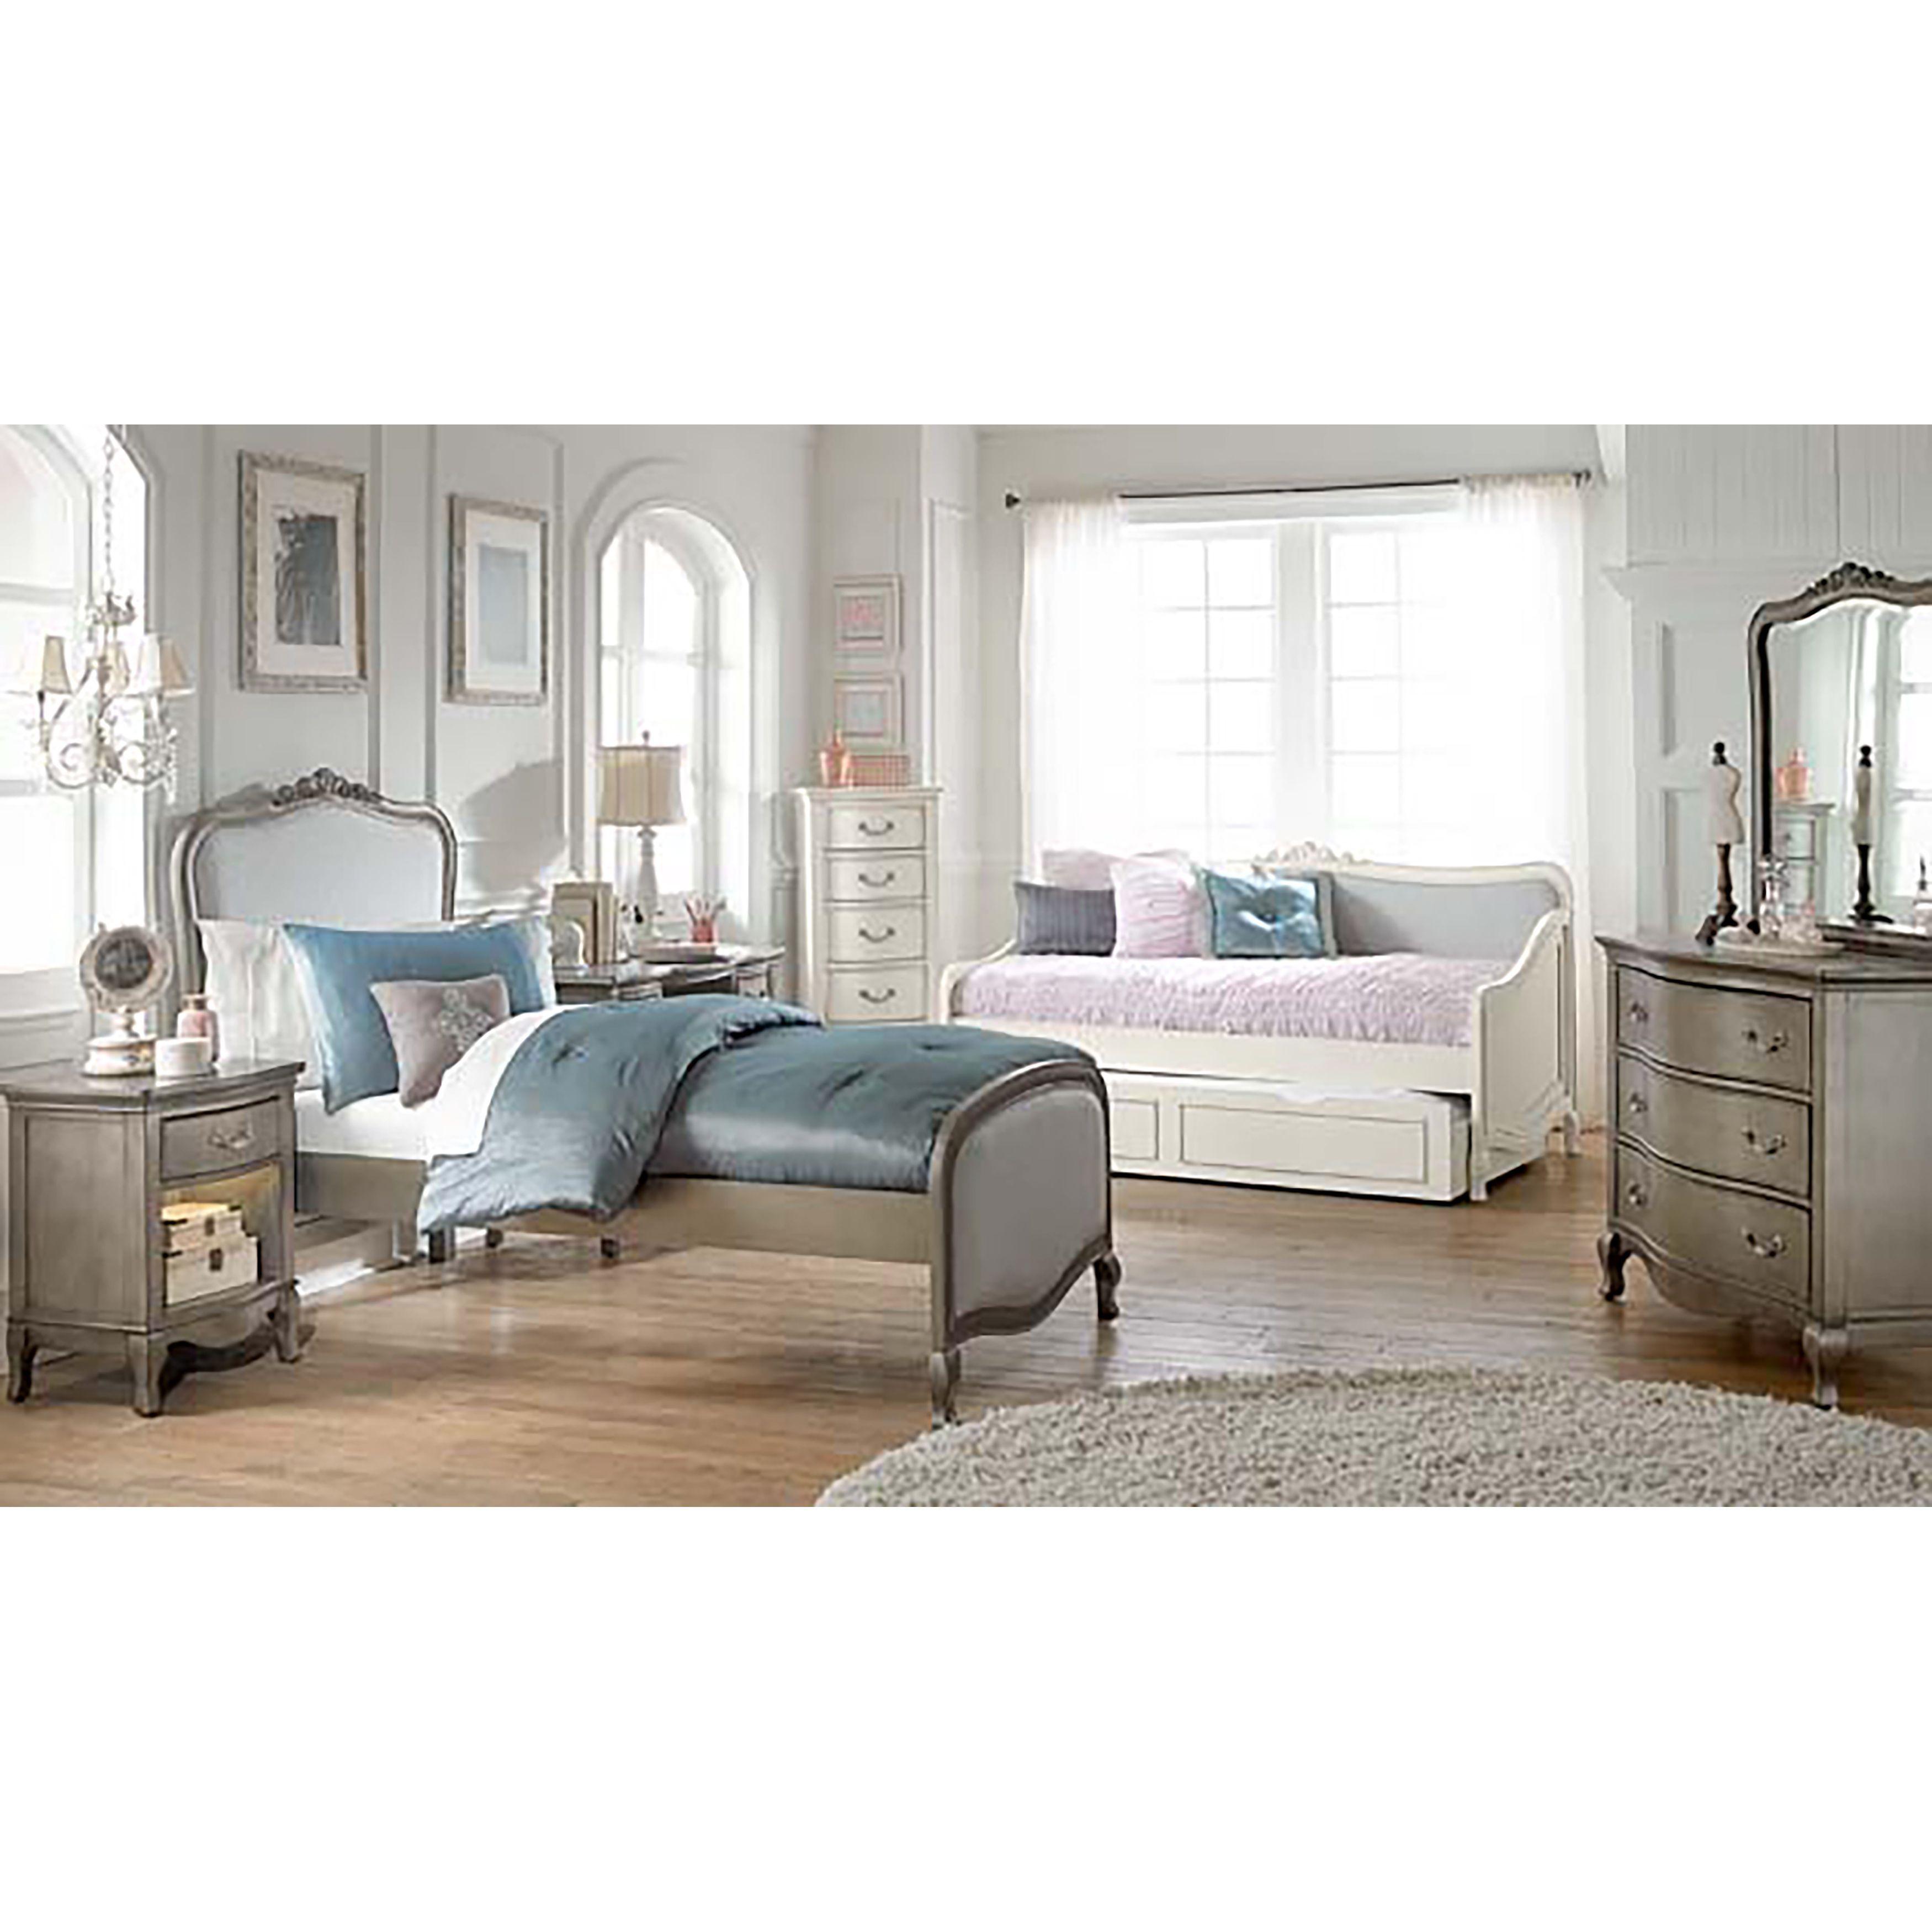 Ne Kids Kensington Katherine Antique Silver Upholstered Twin Size